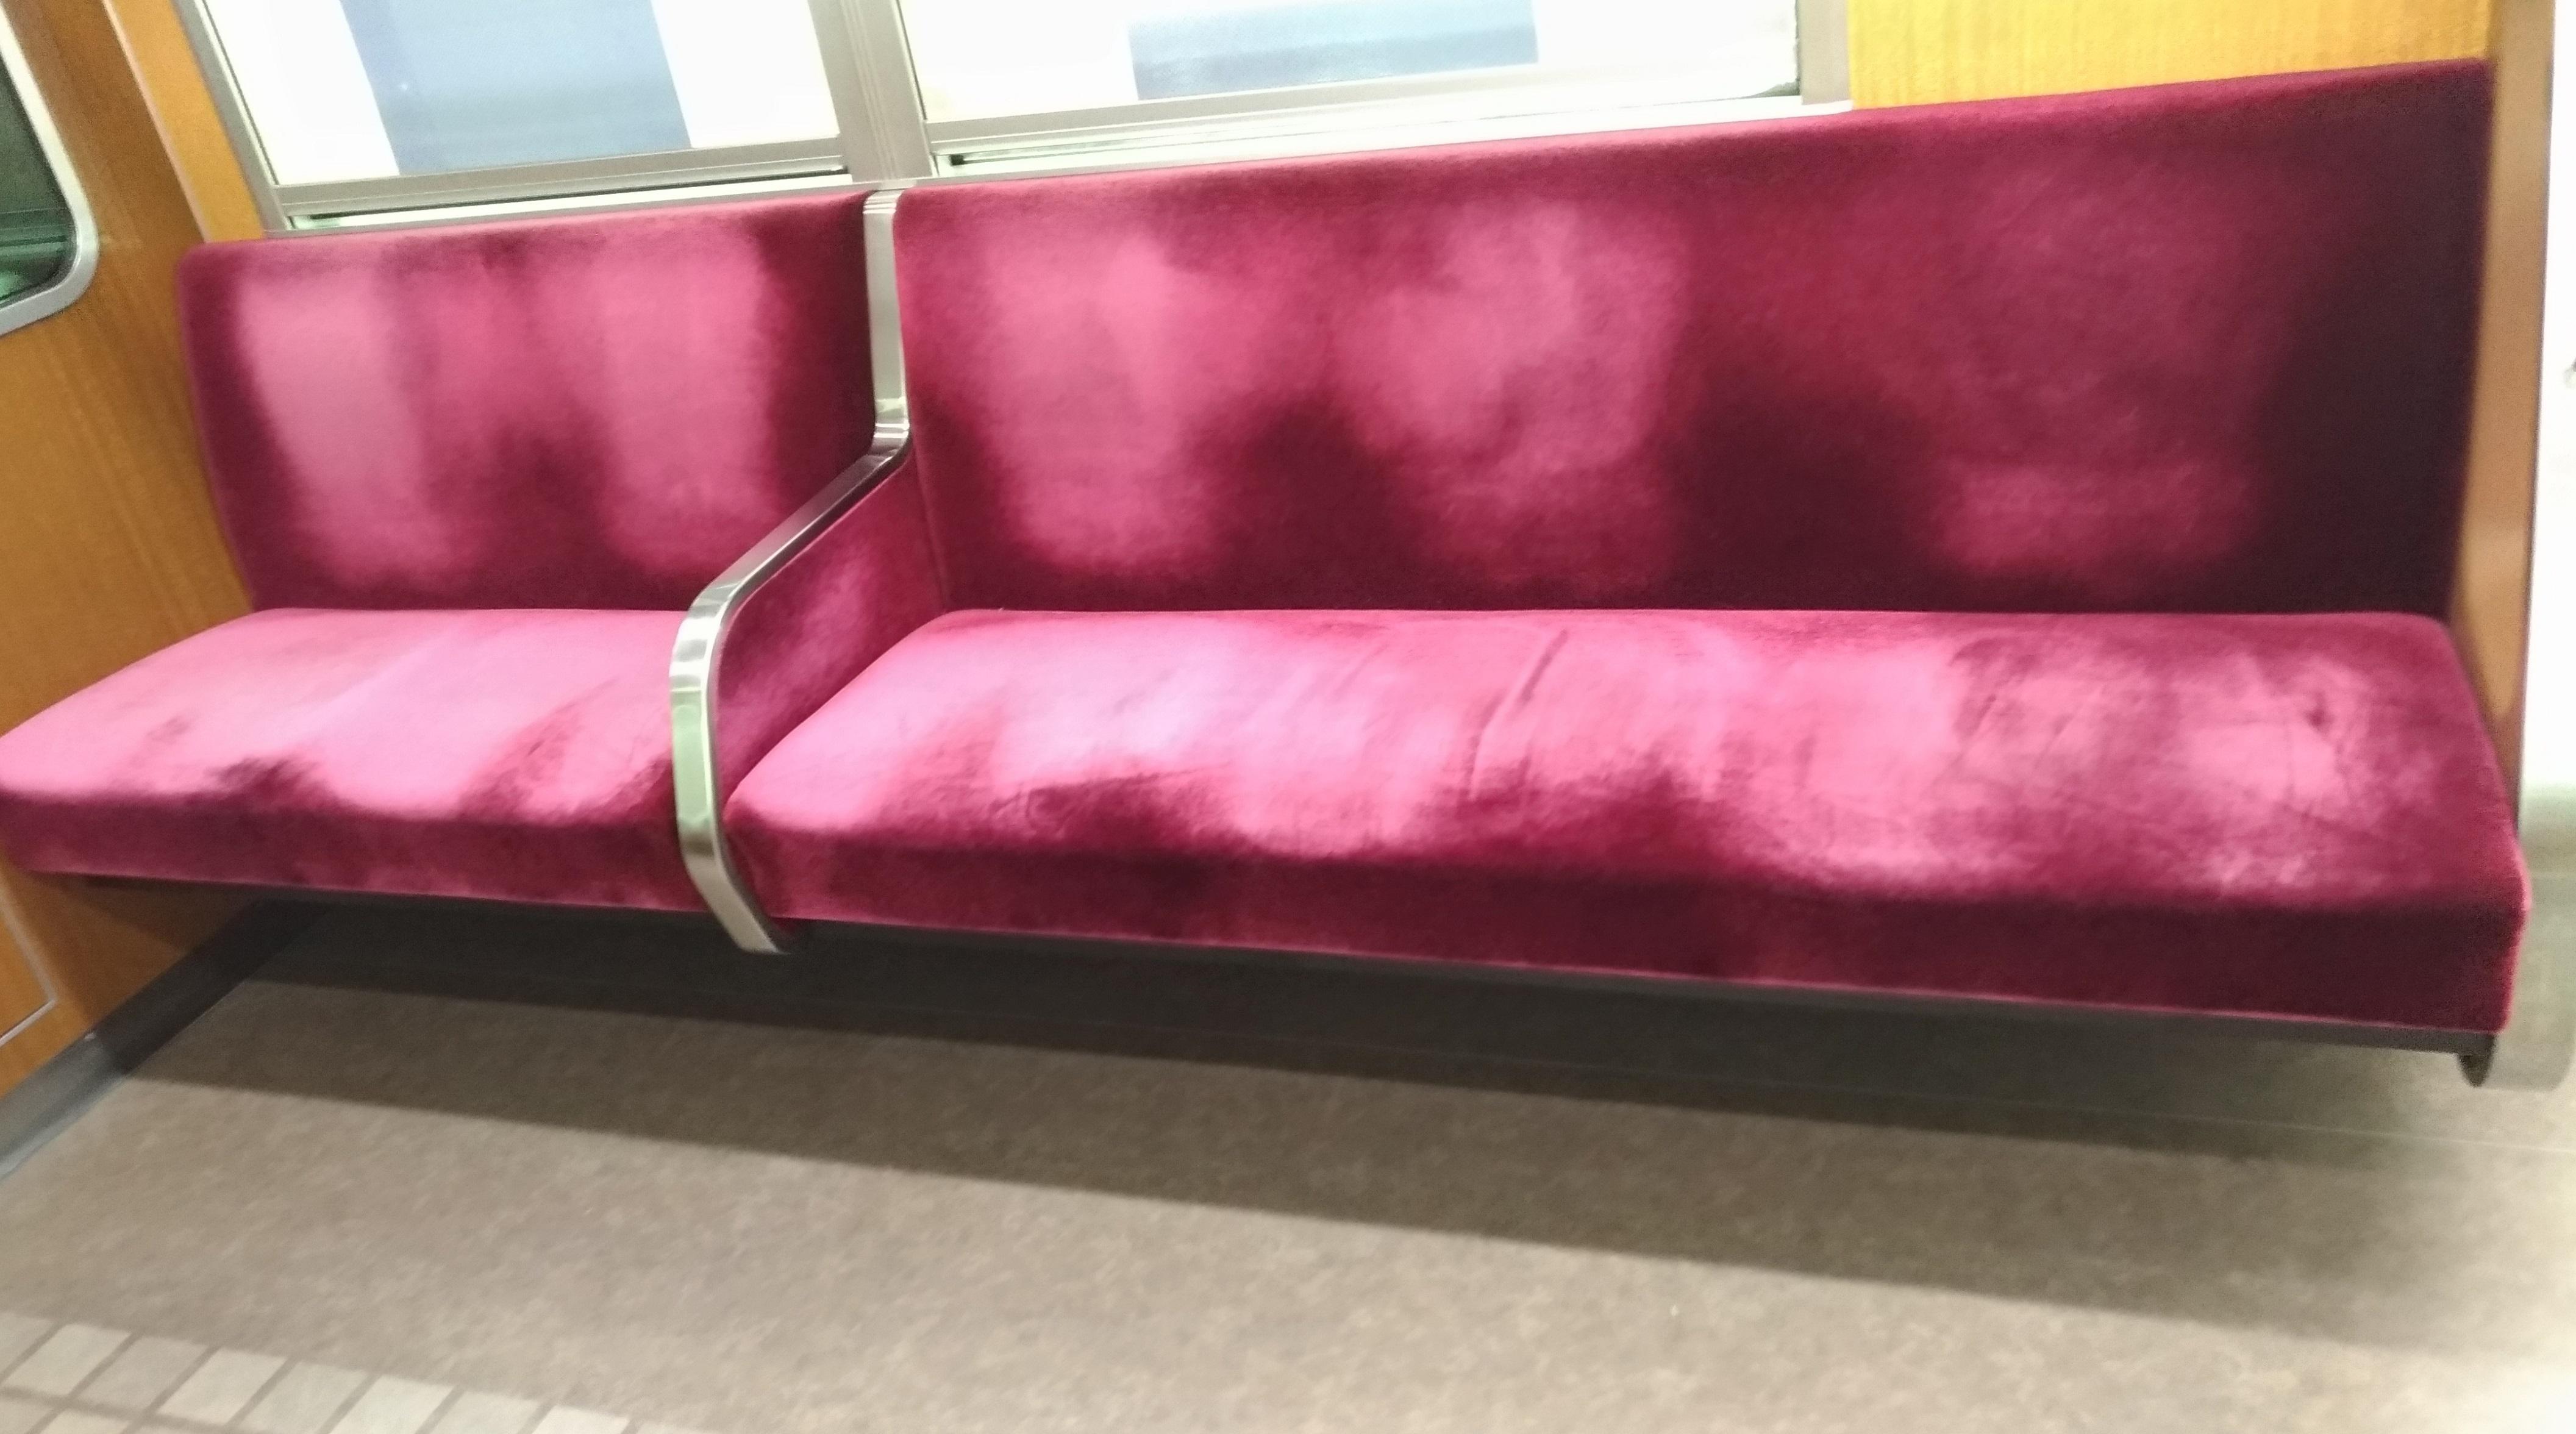 umeda_osaka_2020_0821_trains_2.jpg